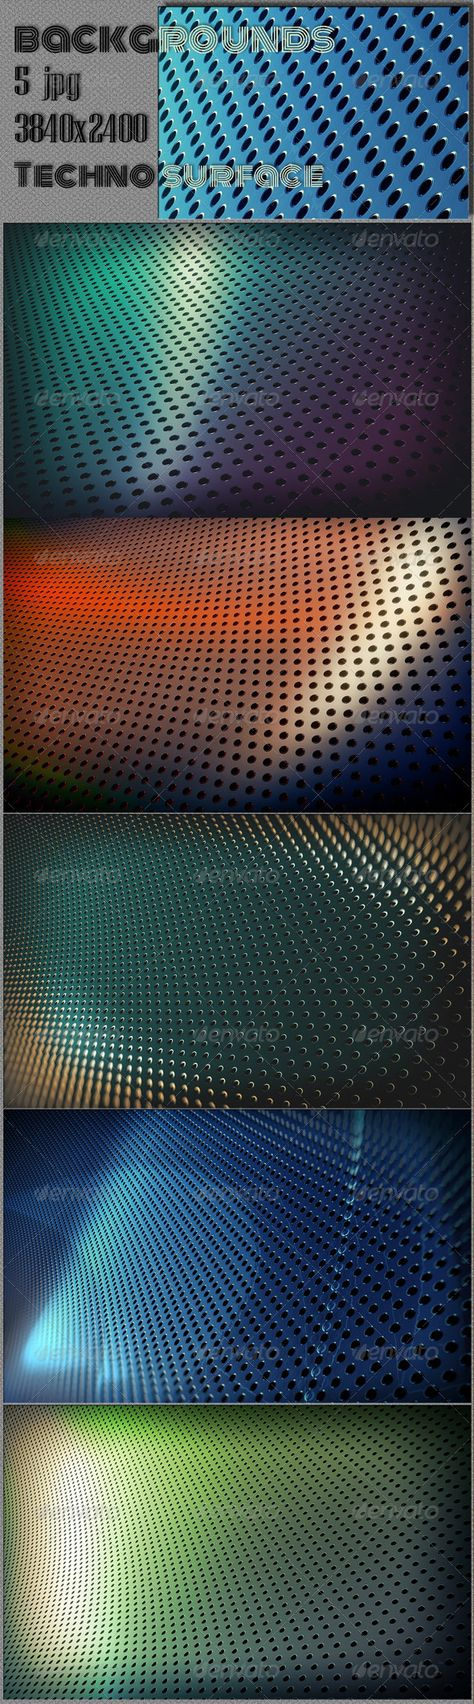 Techno Surface Web backgrounds